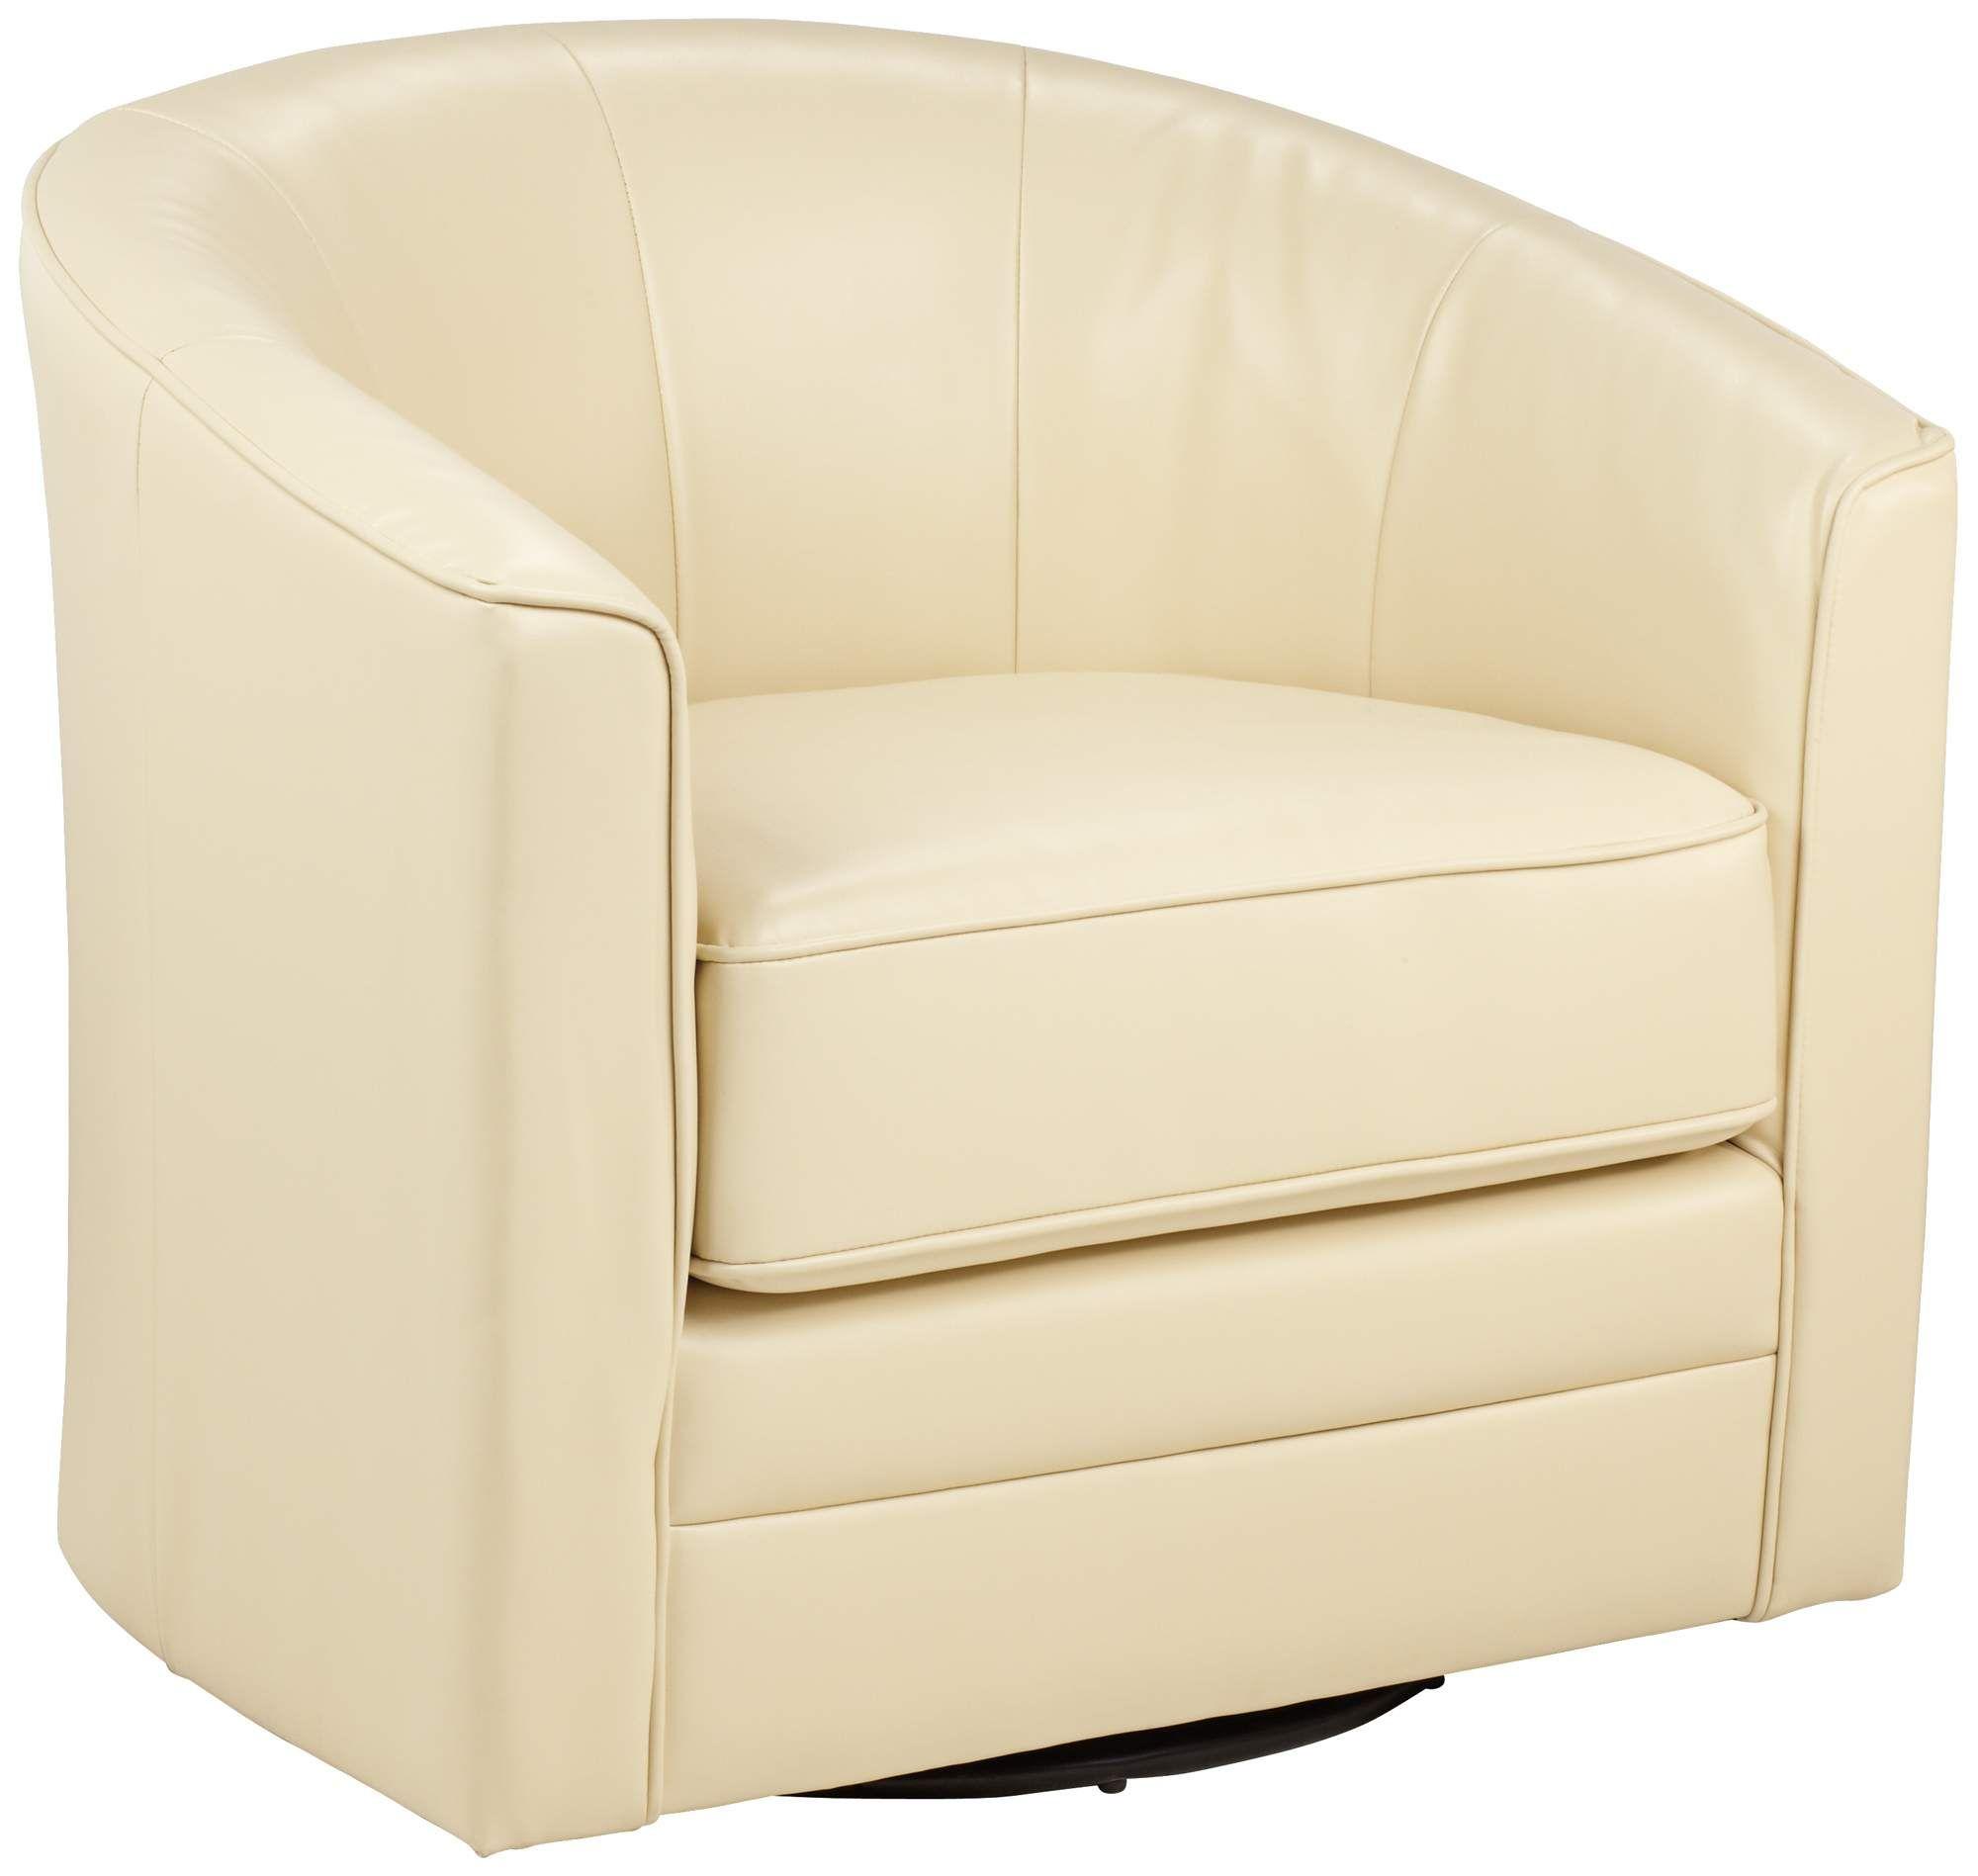 Attirant Keller Ivory Bonded Leather Swivel Tub Chair | 55DowningStreet.com